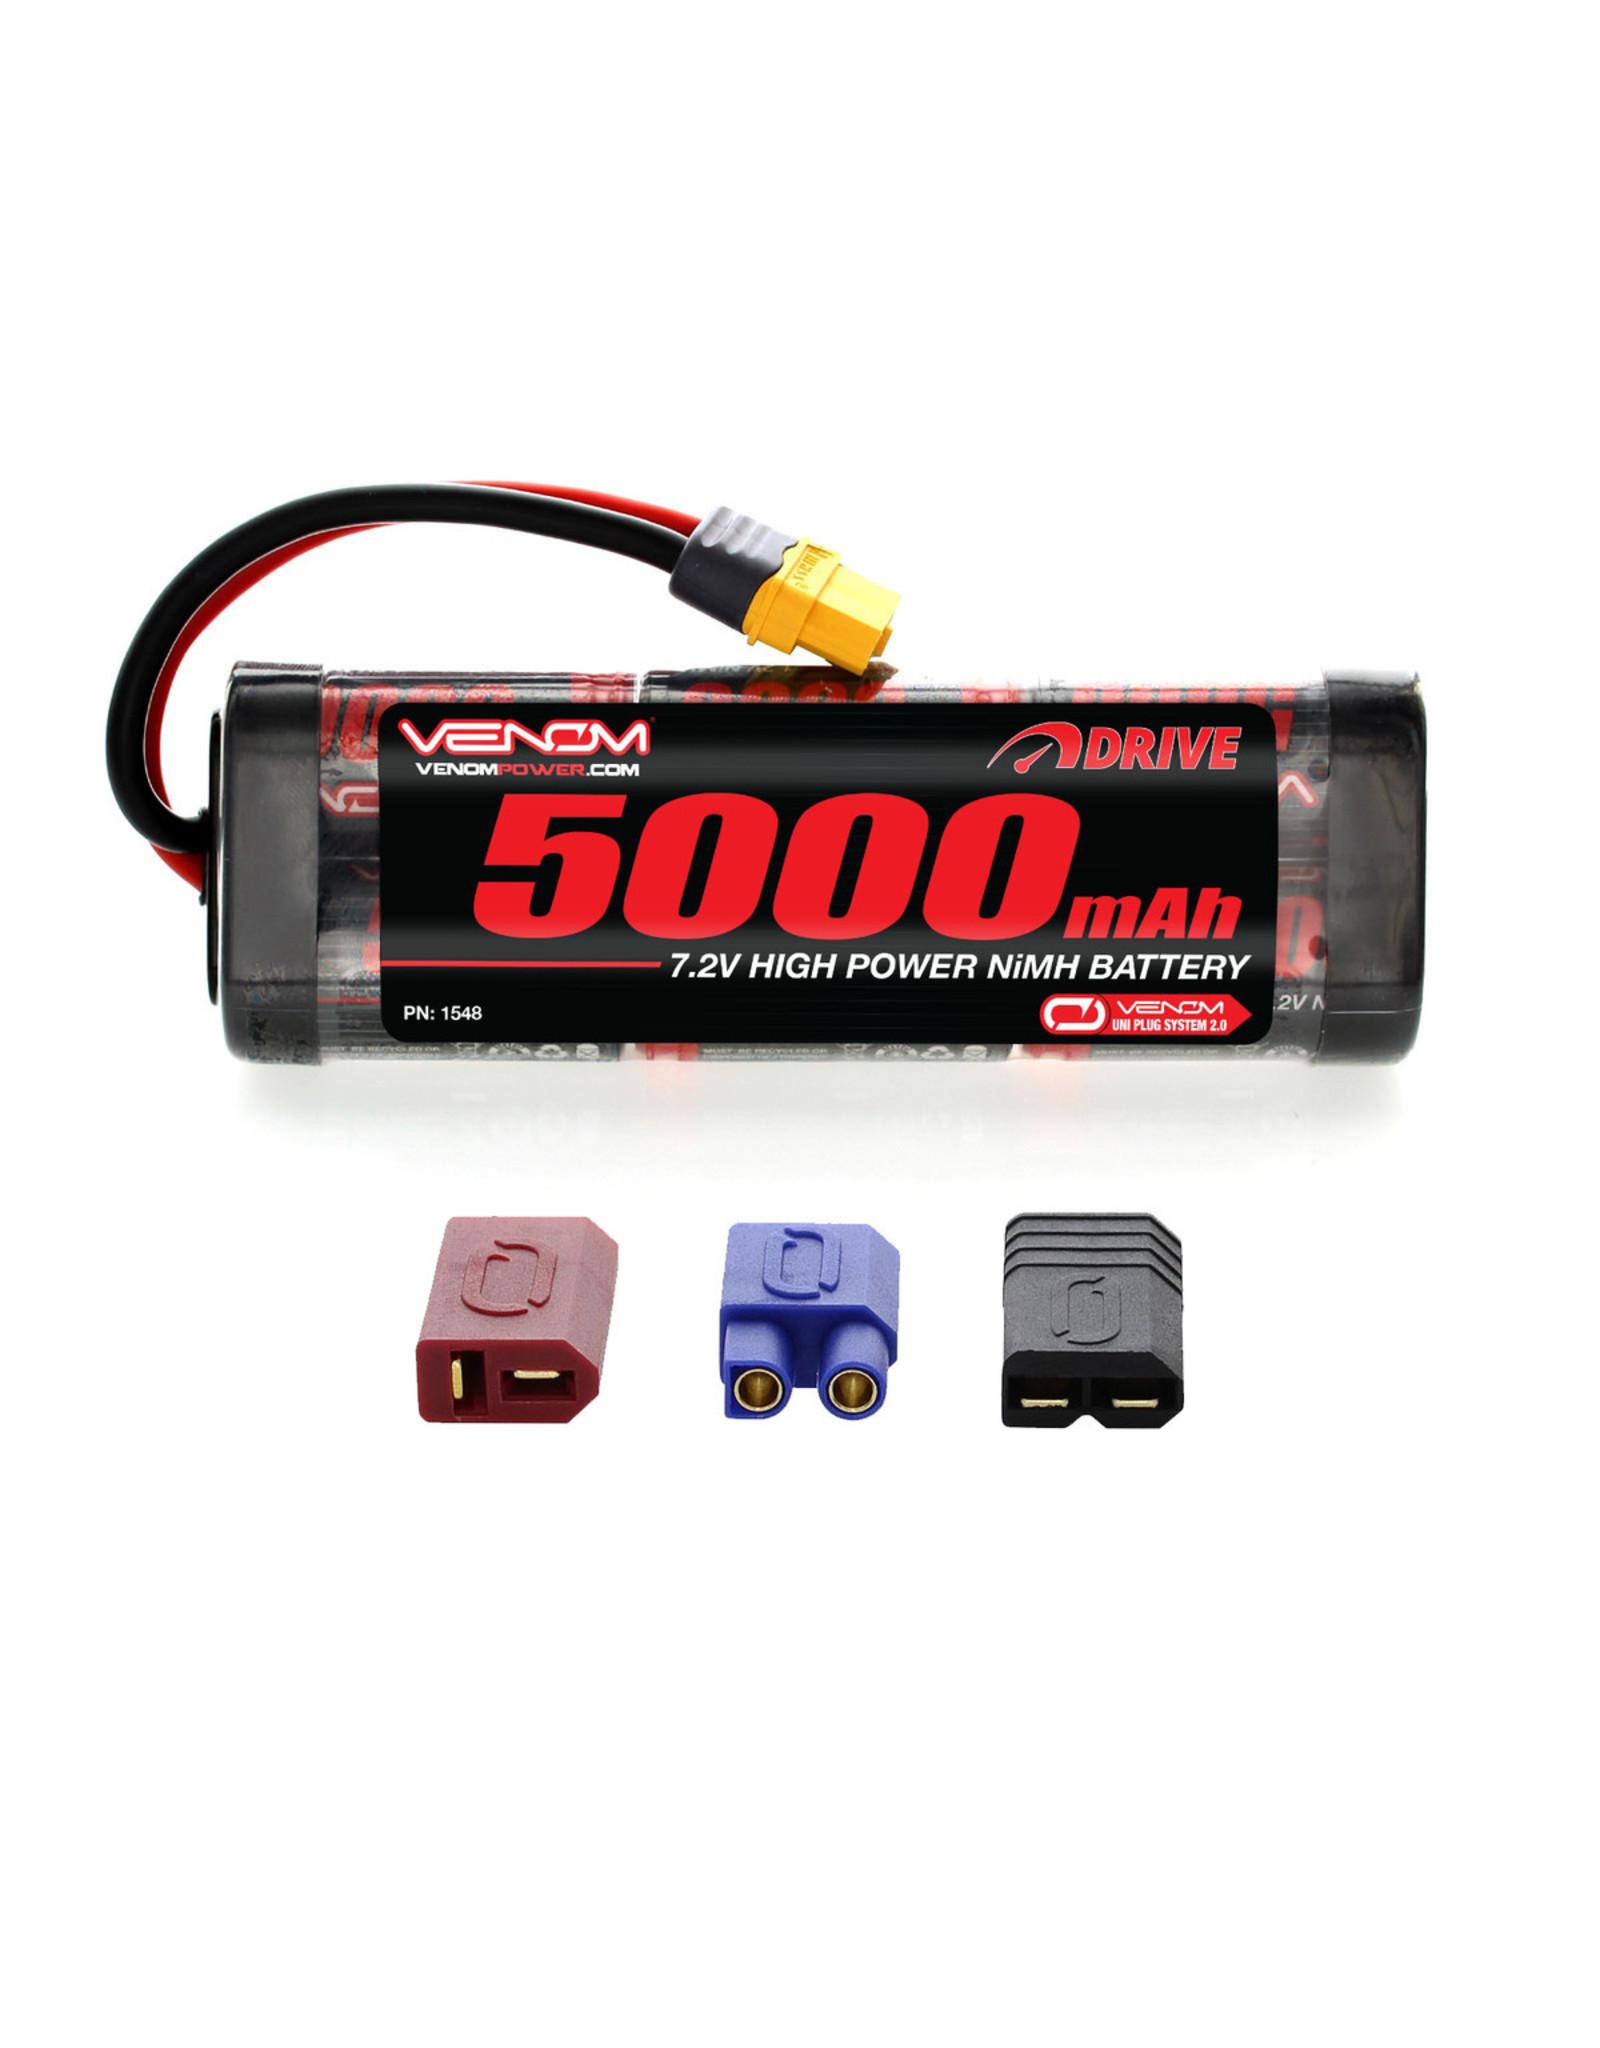 Venom Power 6-Cell 7.2V 5000mAh NiMH Flat Battery: UNI 2.0 Plug  (VNR1548)